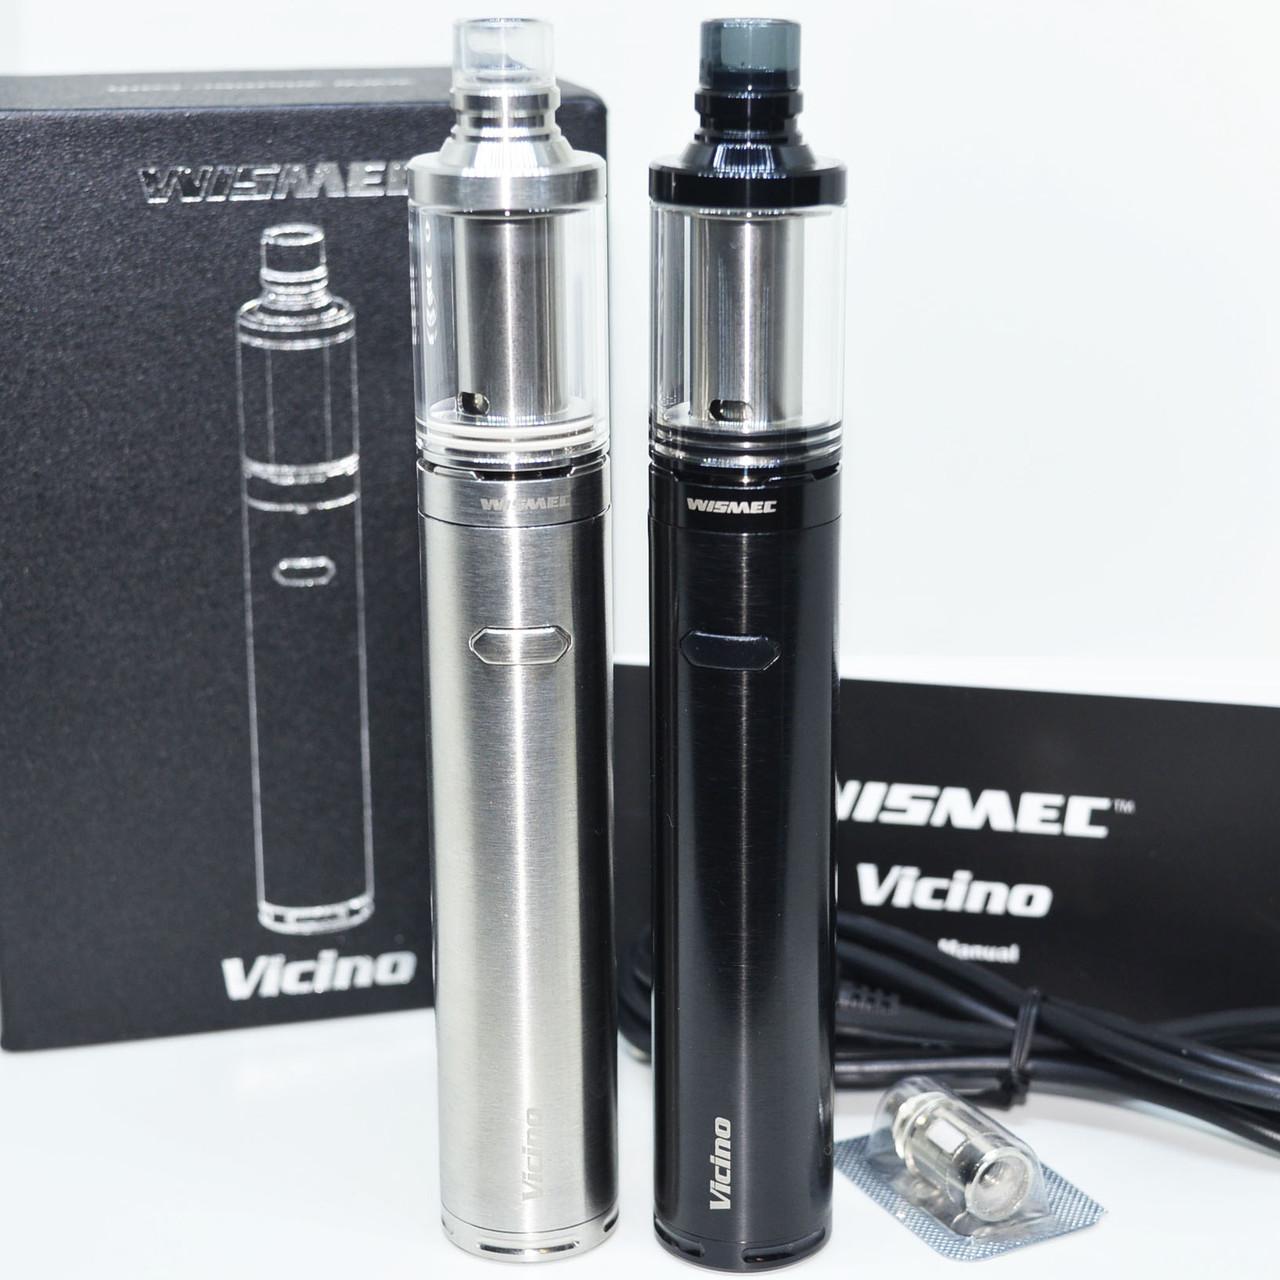 Wismec Vicino 18650 60w